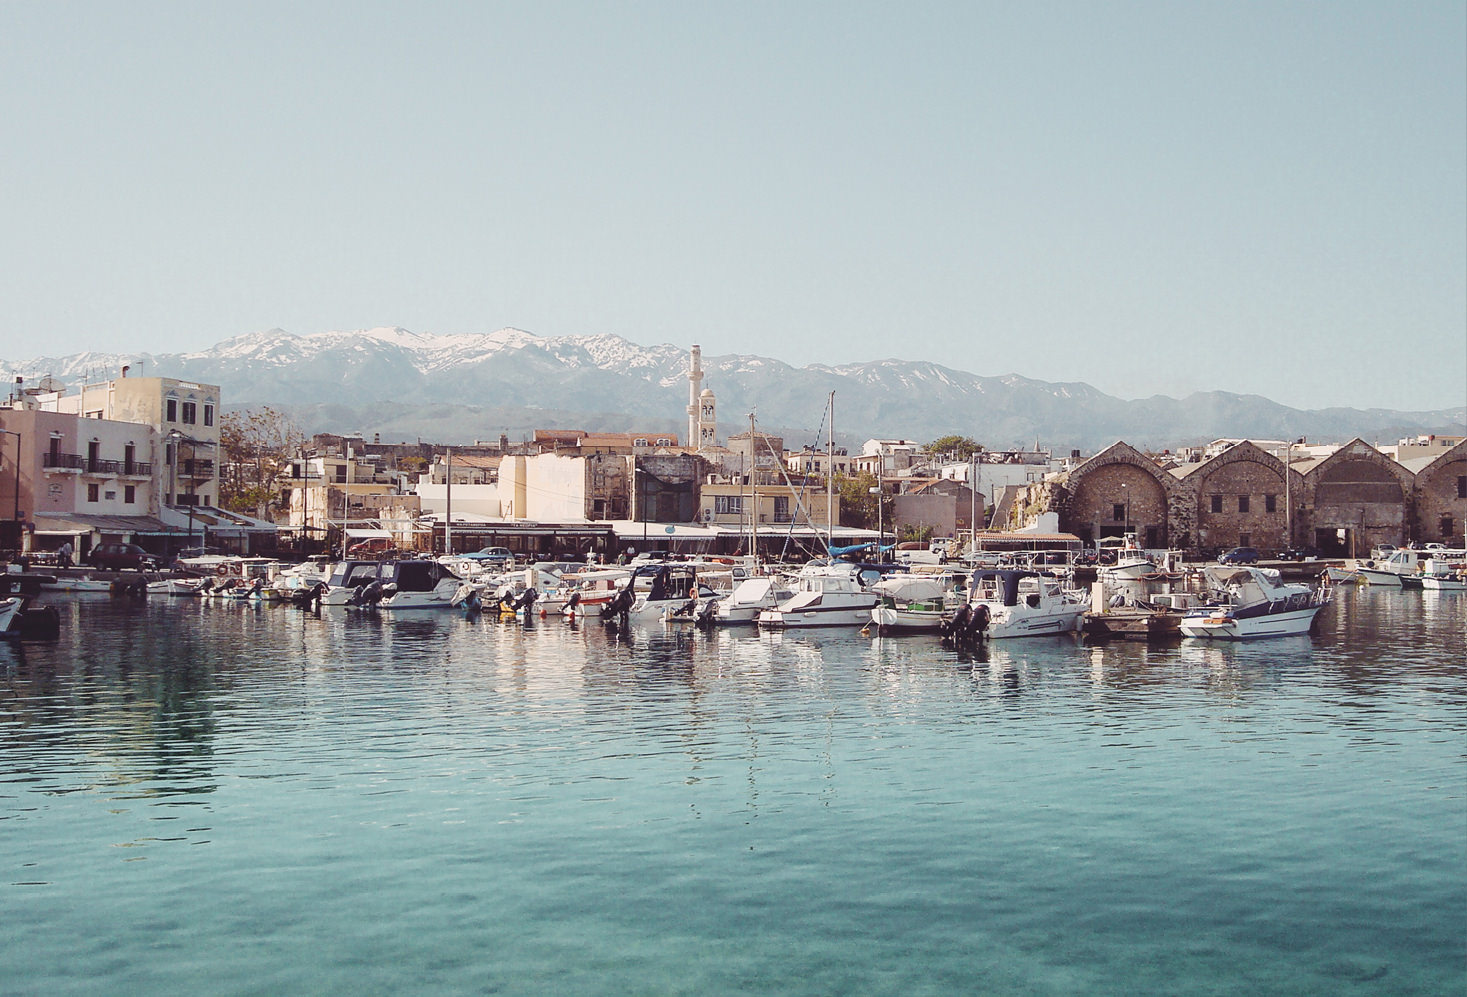 180131_ccc_12_chania_harbour.jpg